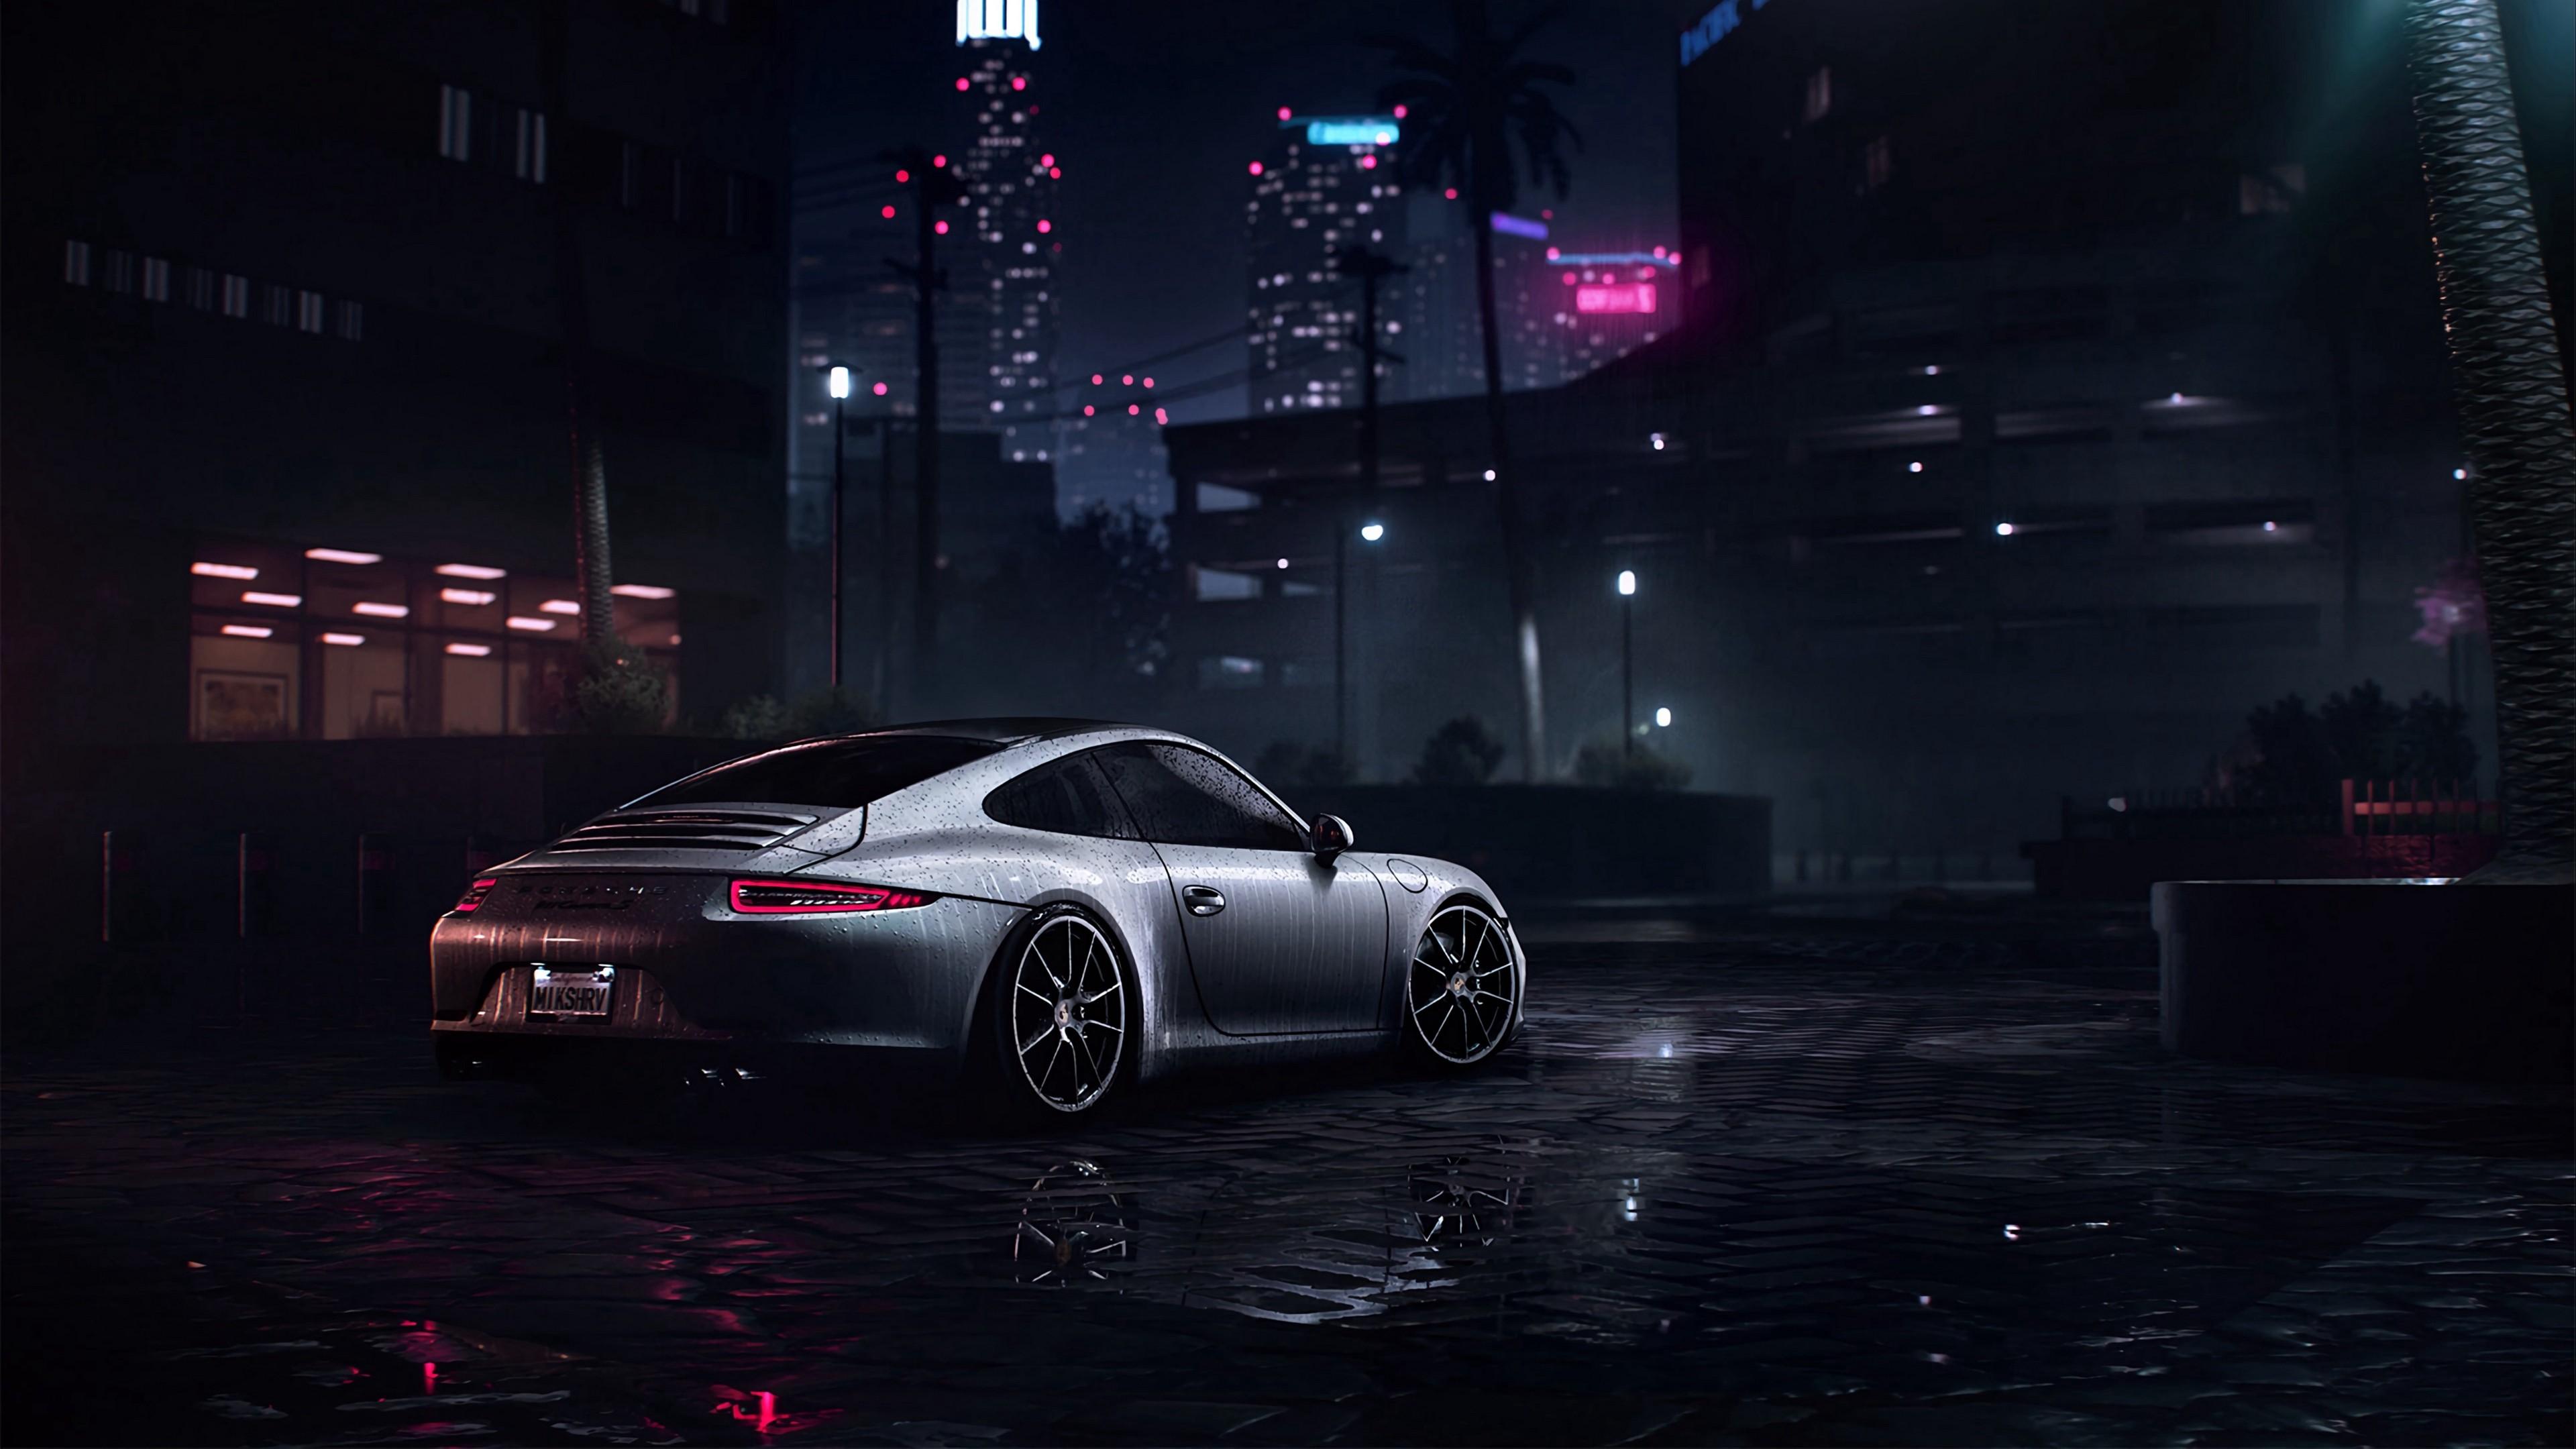 4K Porsche 911 Carrera S Porsche Sportscar Wallpaper ...